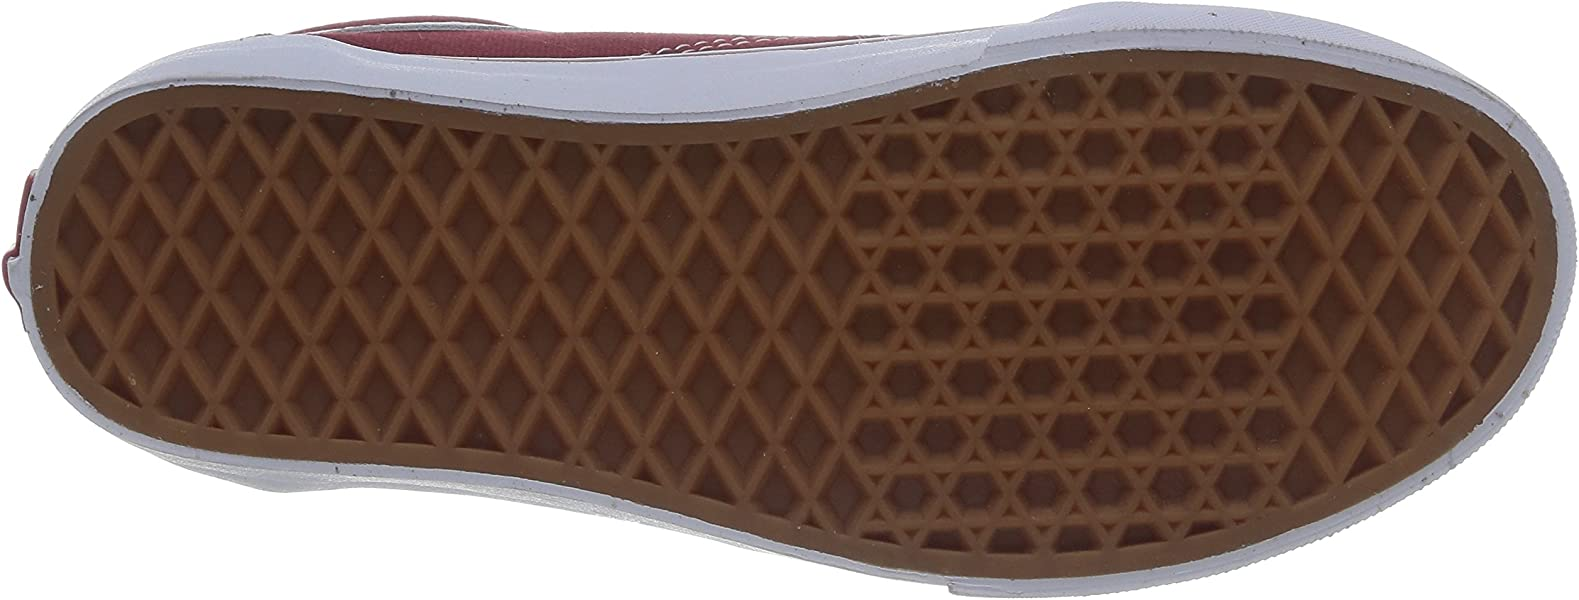 836ea54b8e Vans Unisex Old Skool Sneaker